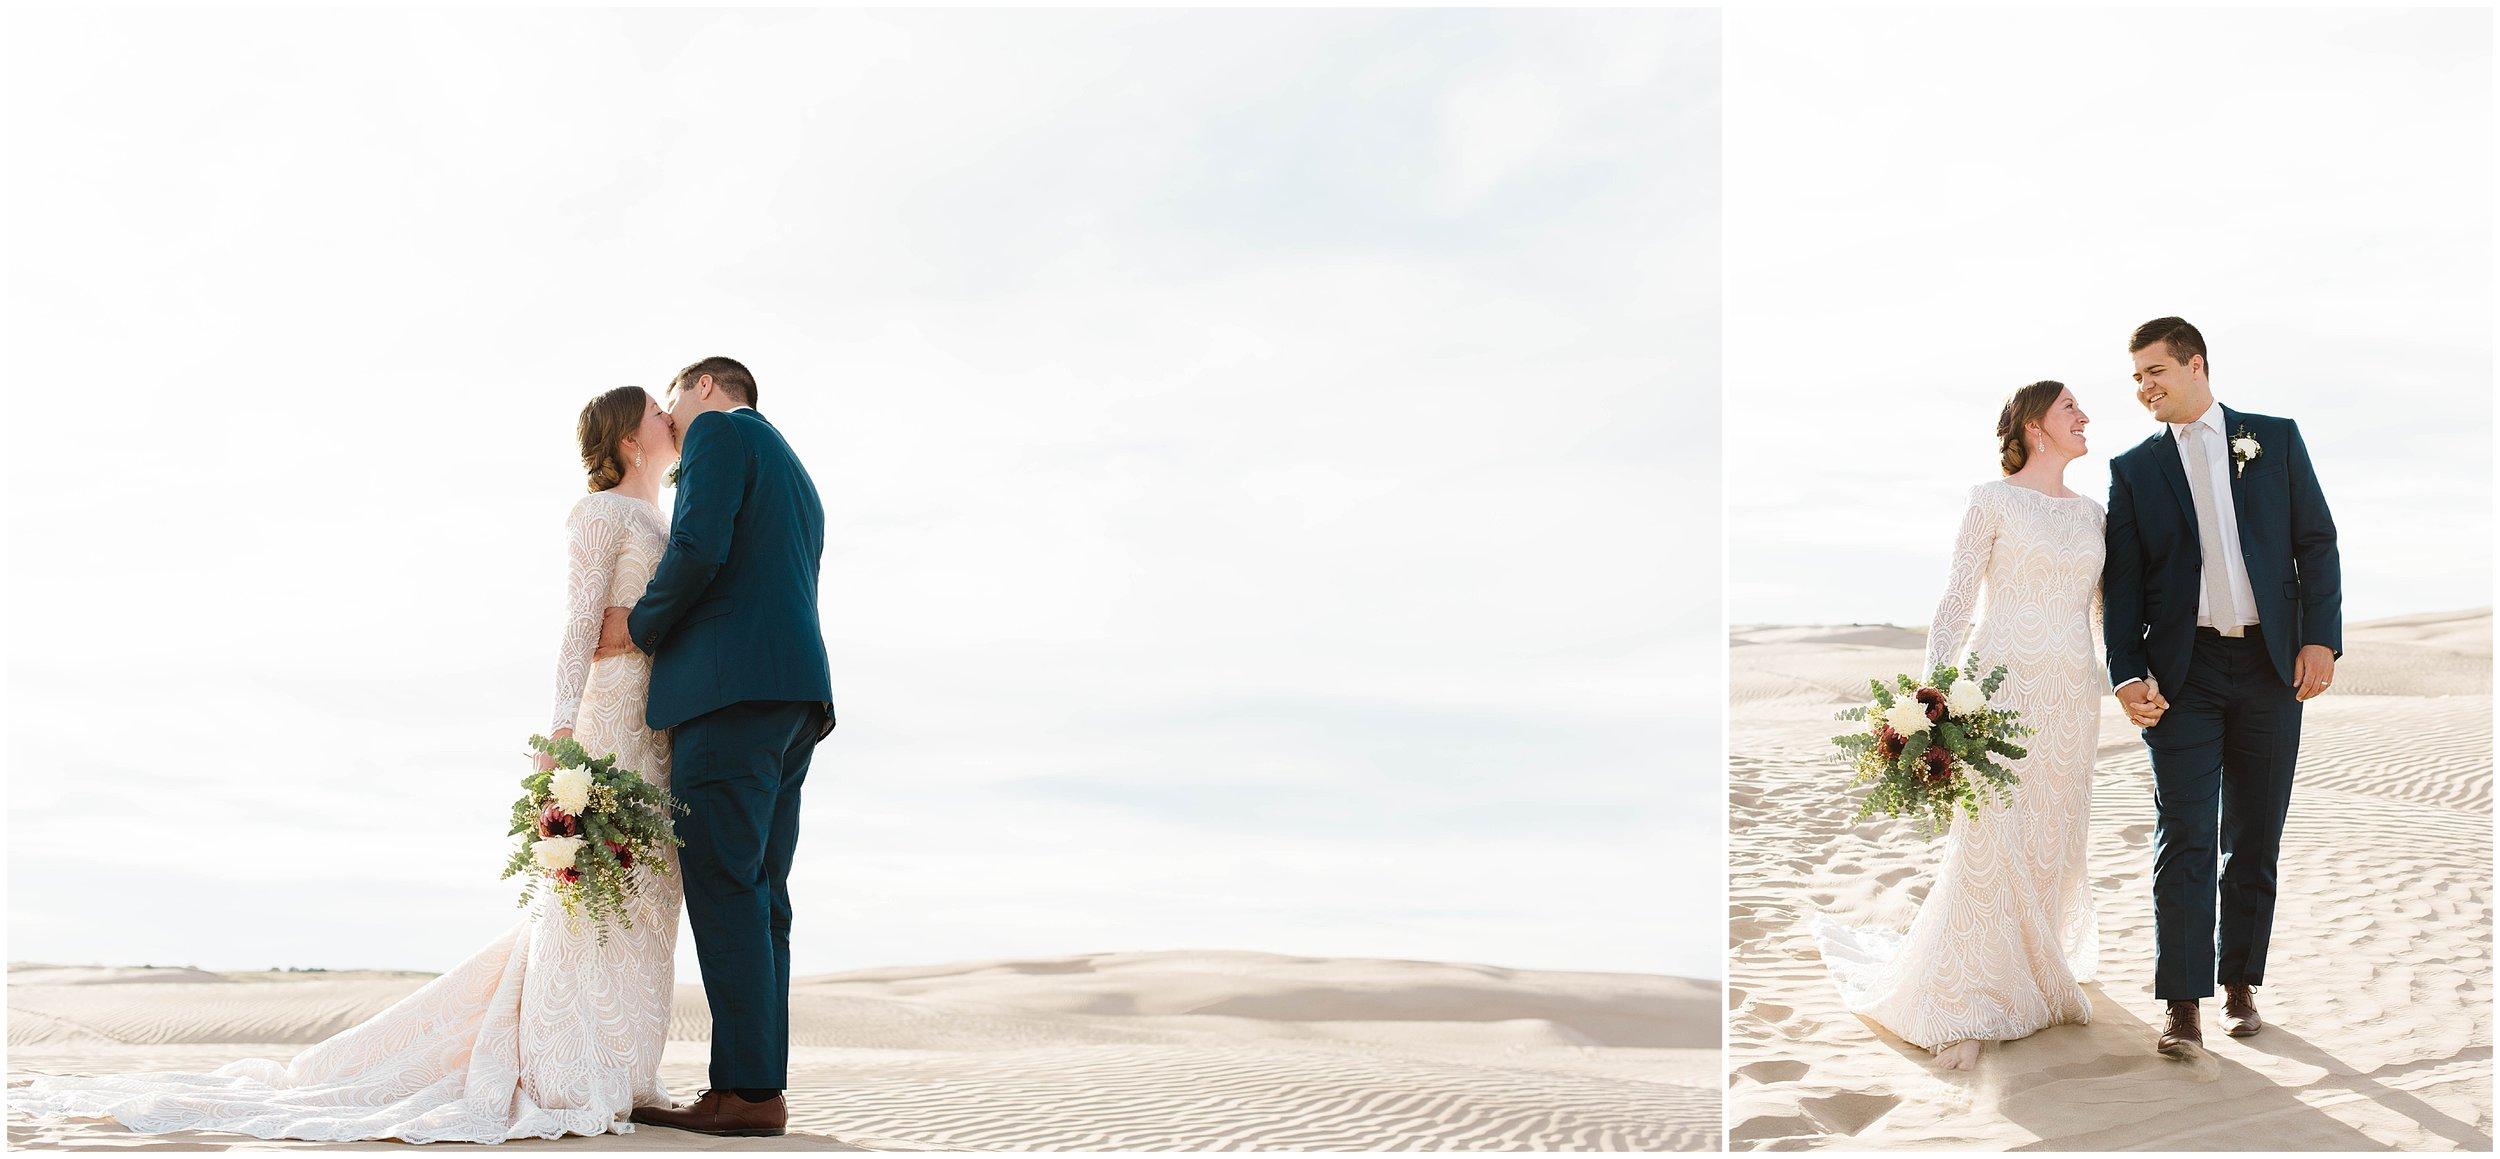 little-sahara-sand-dunes-wedding-amber-lynne-photography.jpg19.jpg